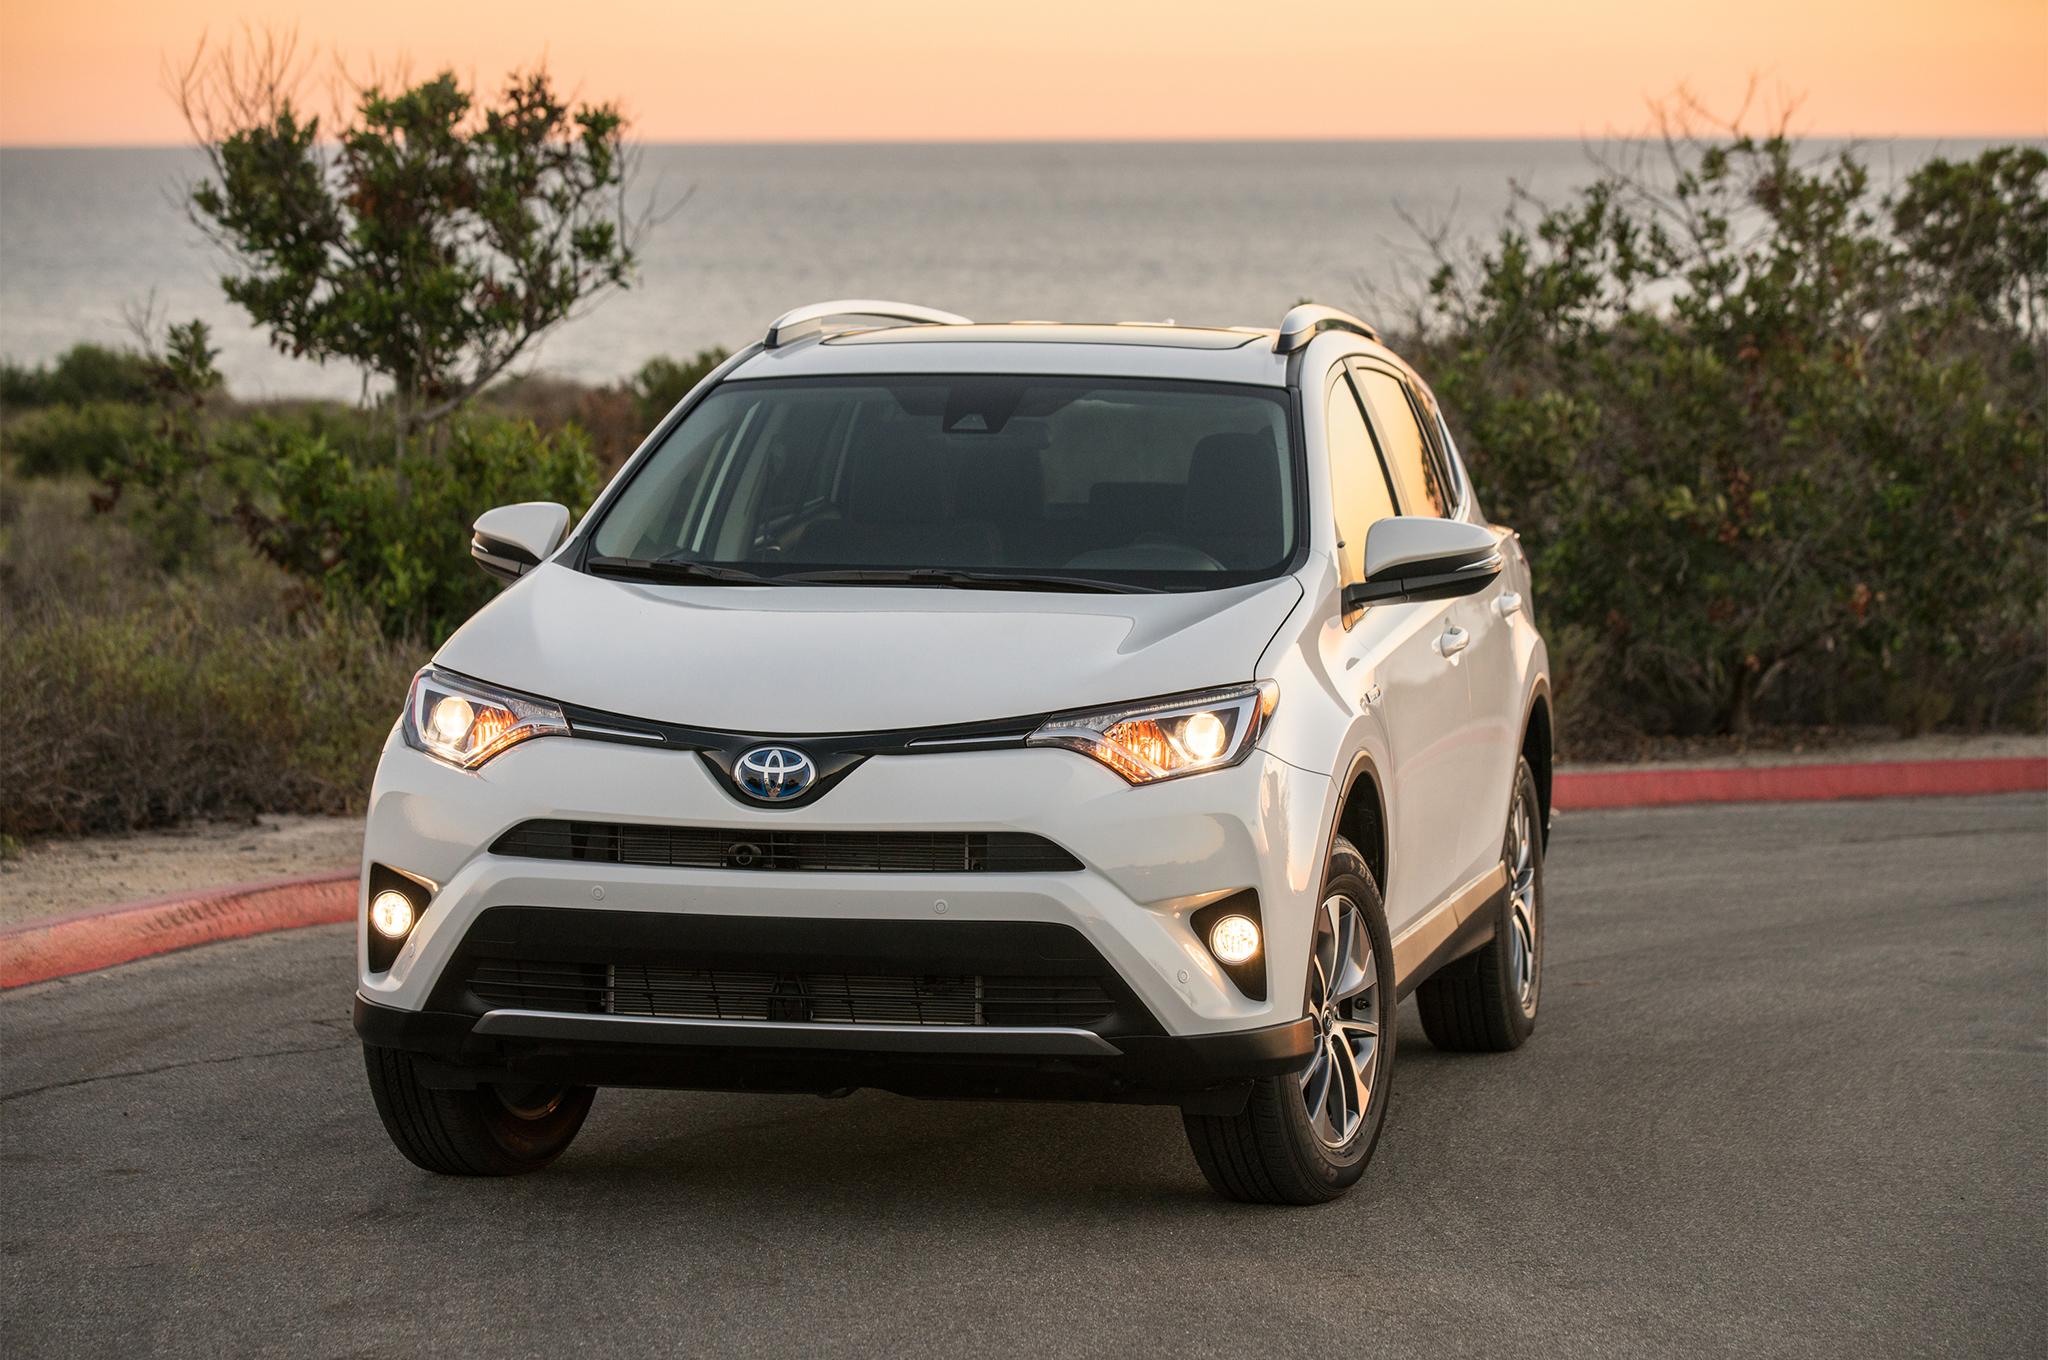 2019 Toyota Rav4 Price Release Date Specs Design